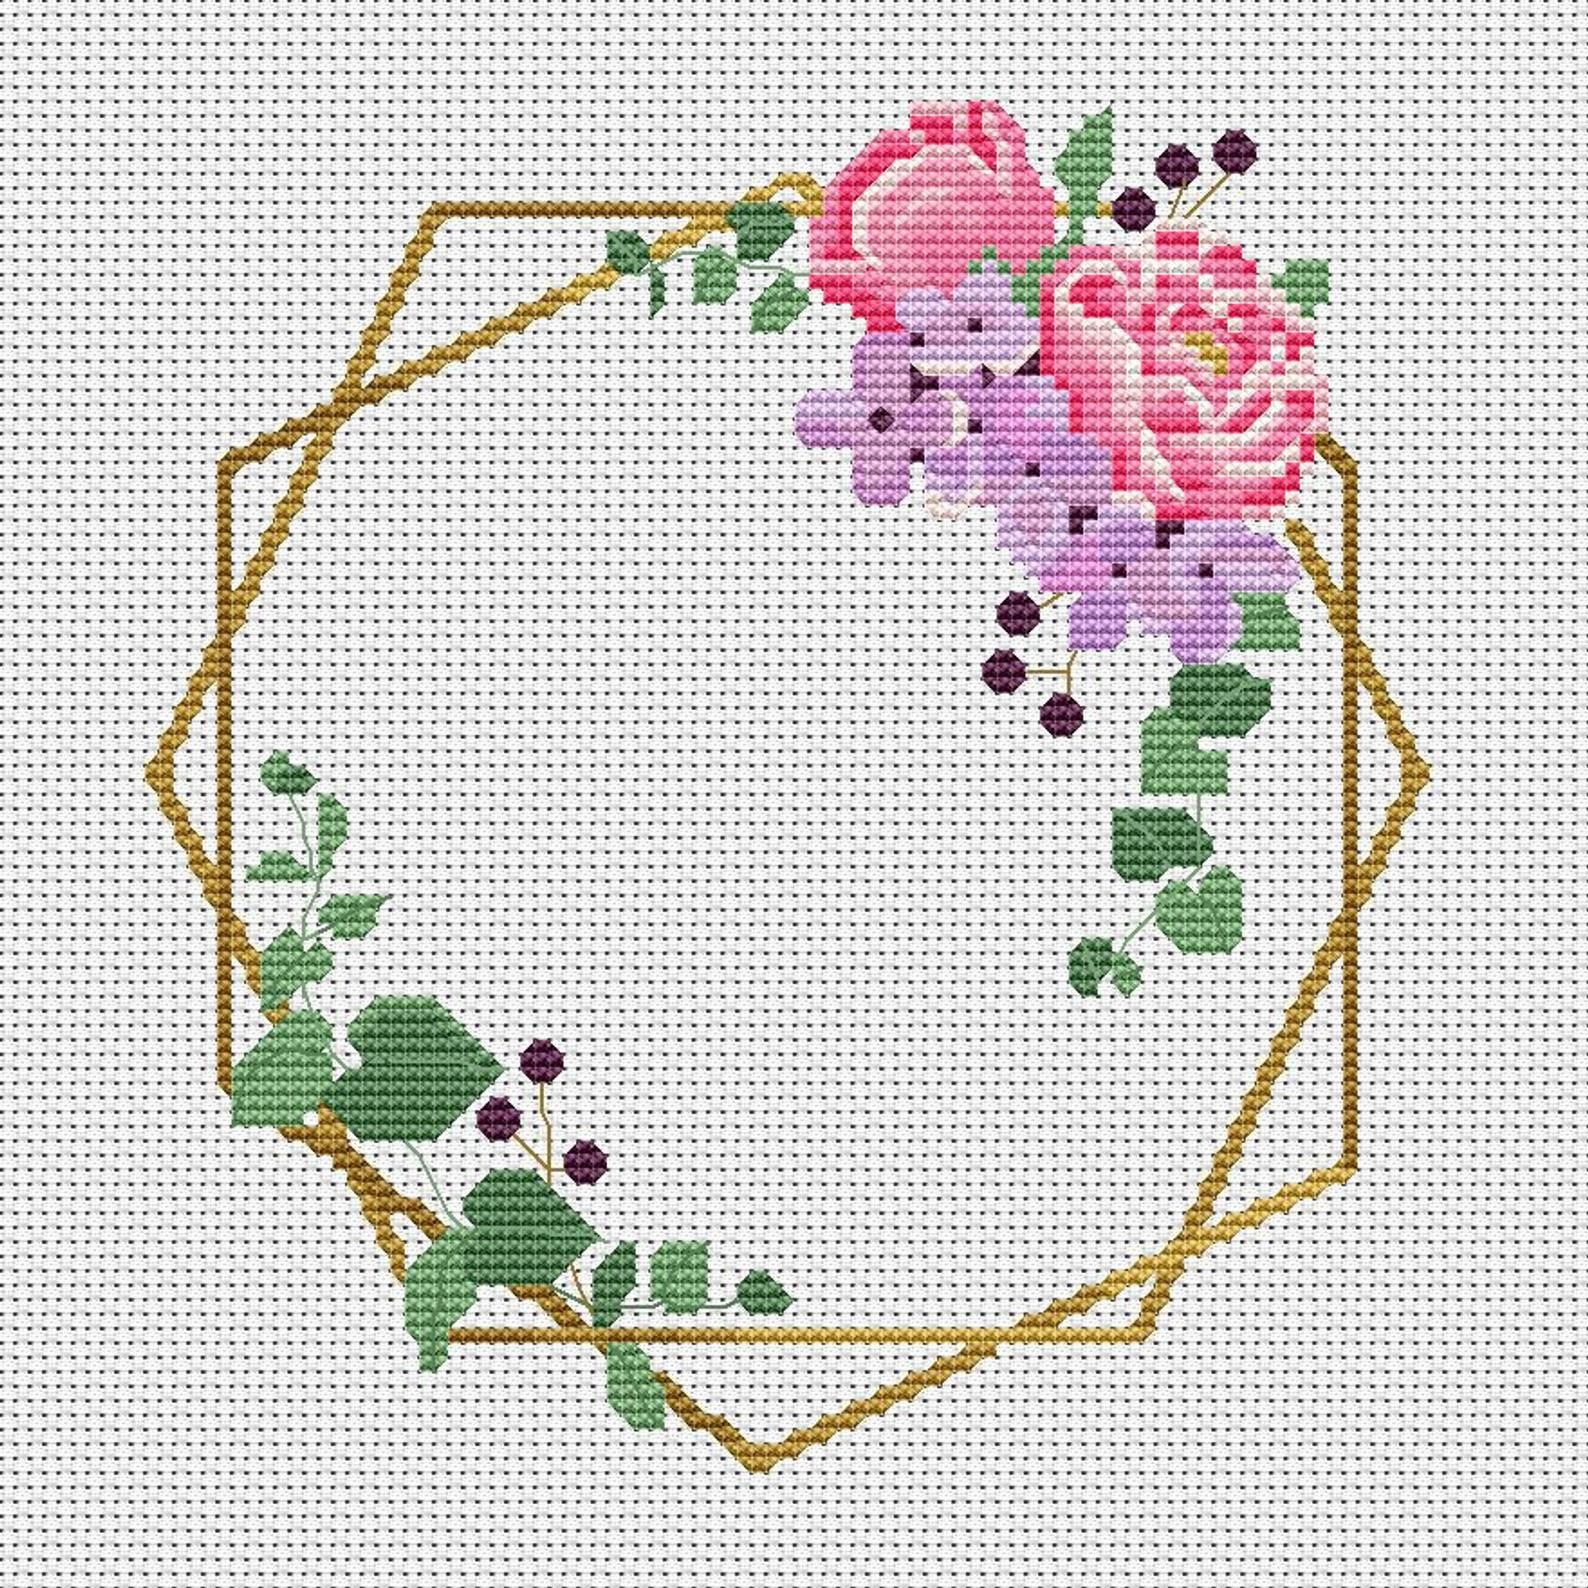 Photo of Floral Wreath cross stitch pattern PDF, Flower cross stitch, Modern Xstitch chart, Floral Needlepoint Design, Cross Stitch Flowers, Hoop Art